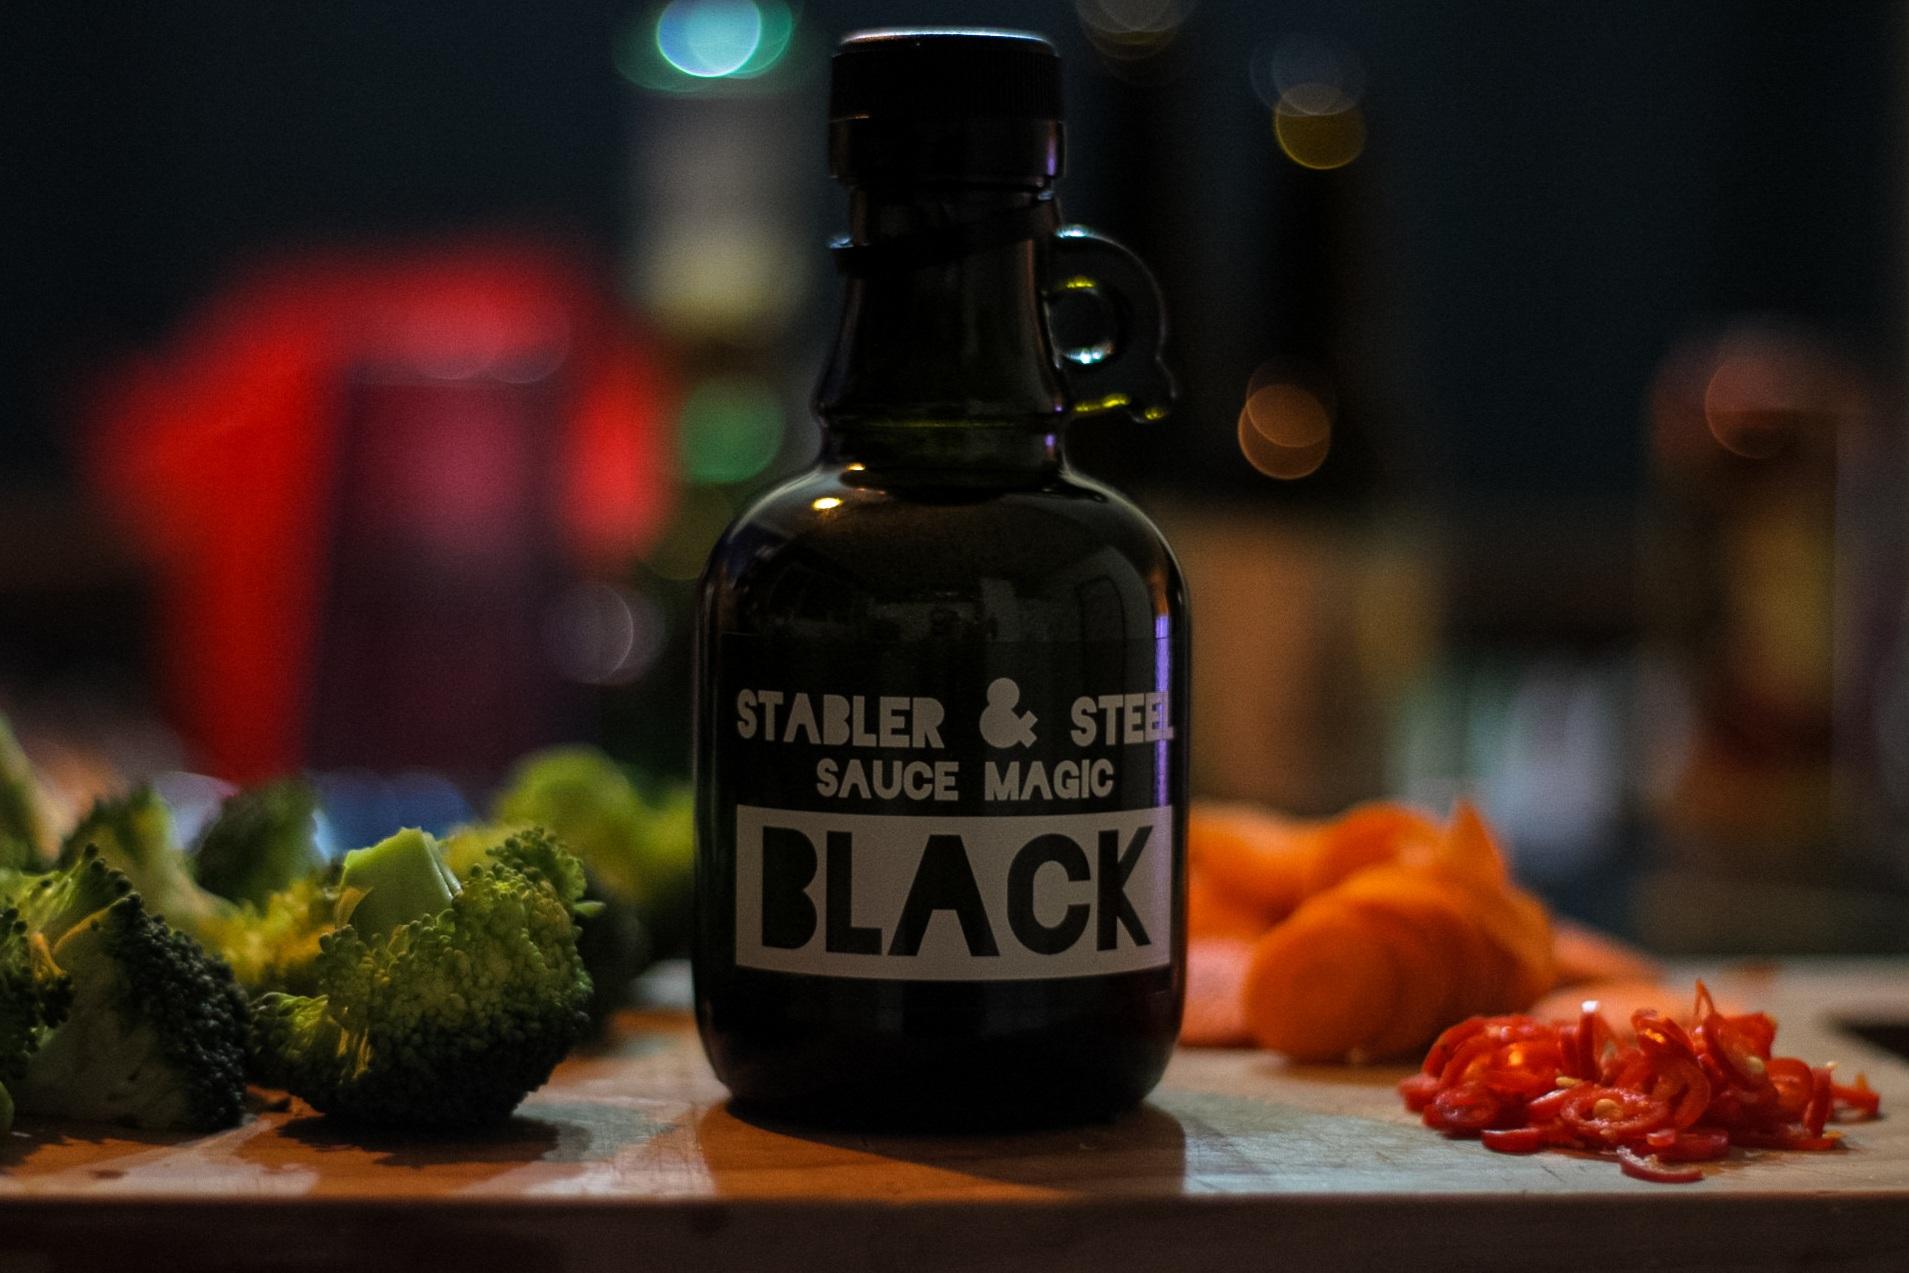 Black_03 (2).jpg